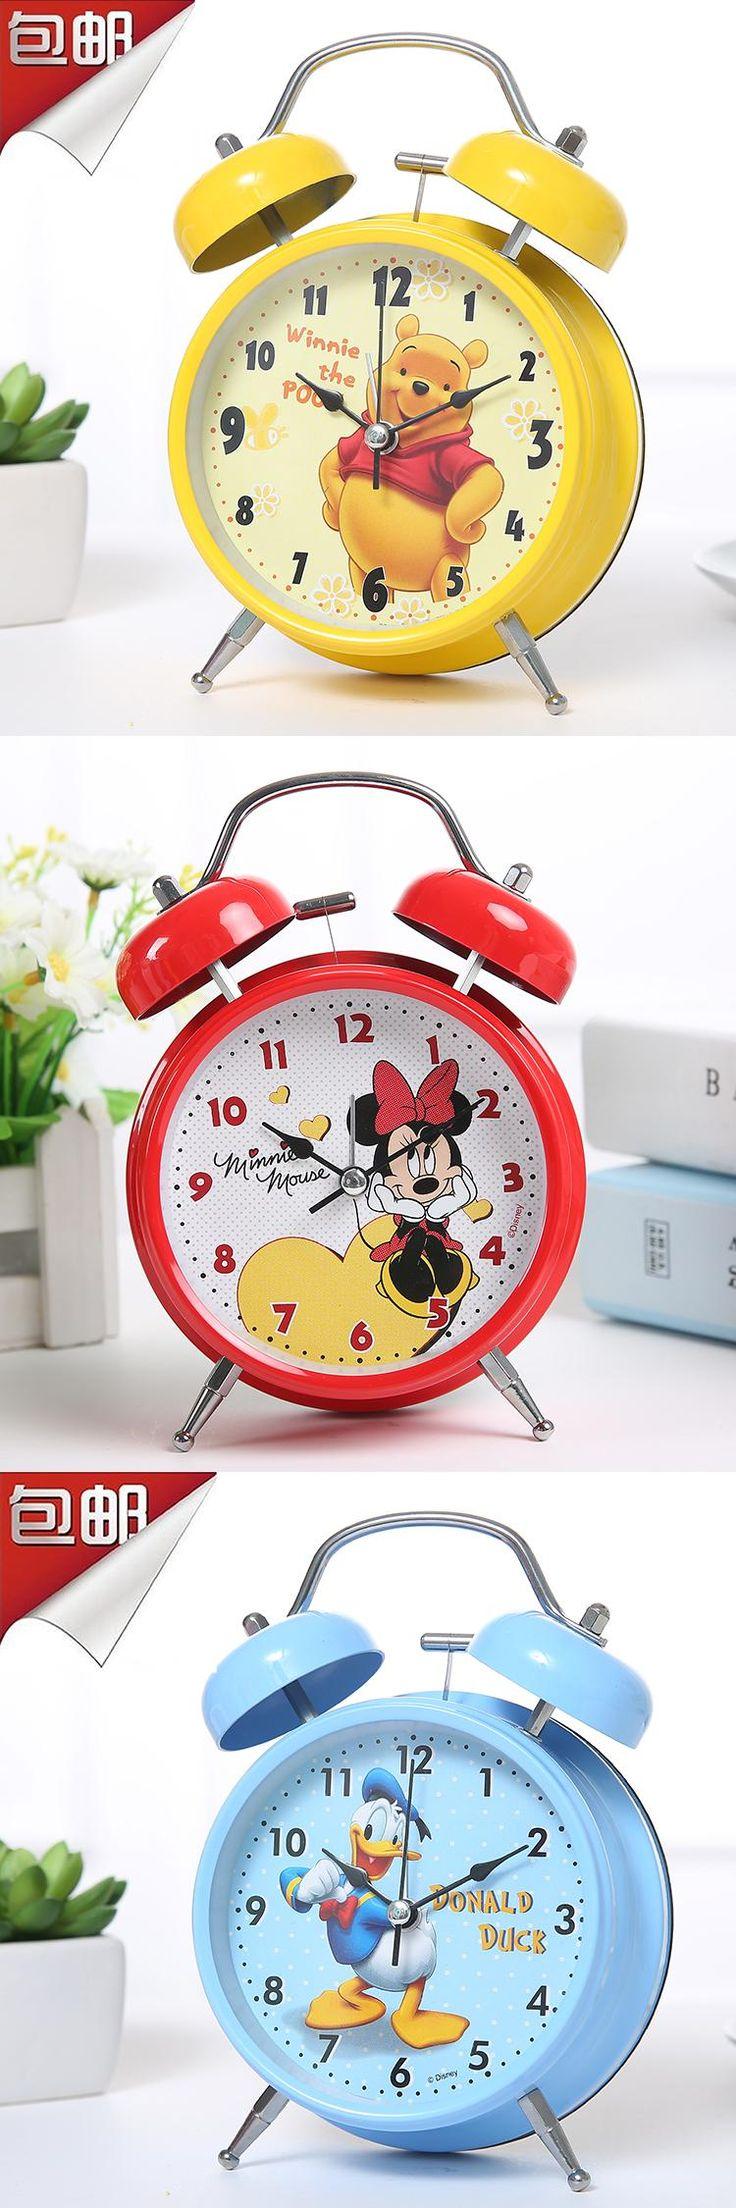 Binaural Metal Students Mute Alarm Clock Bedside Cupboard Large Ringtones Clock With Night Light Creativity Table Clock Bell